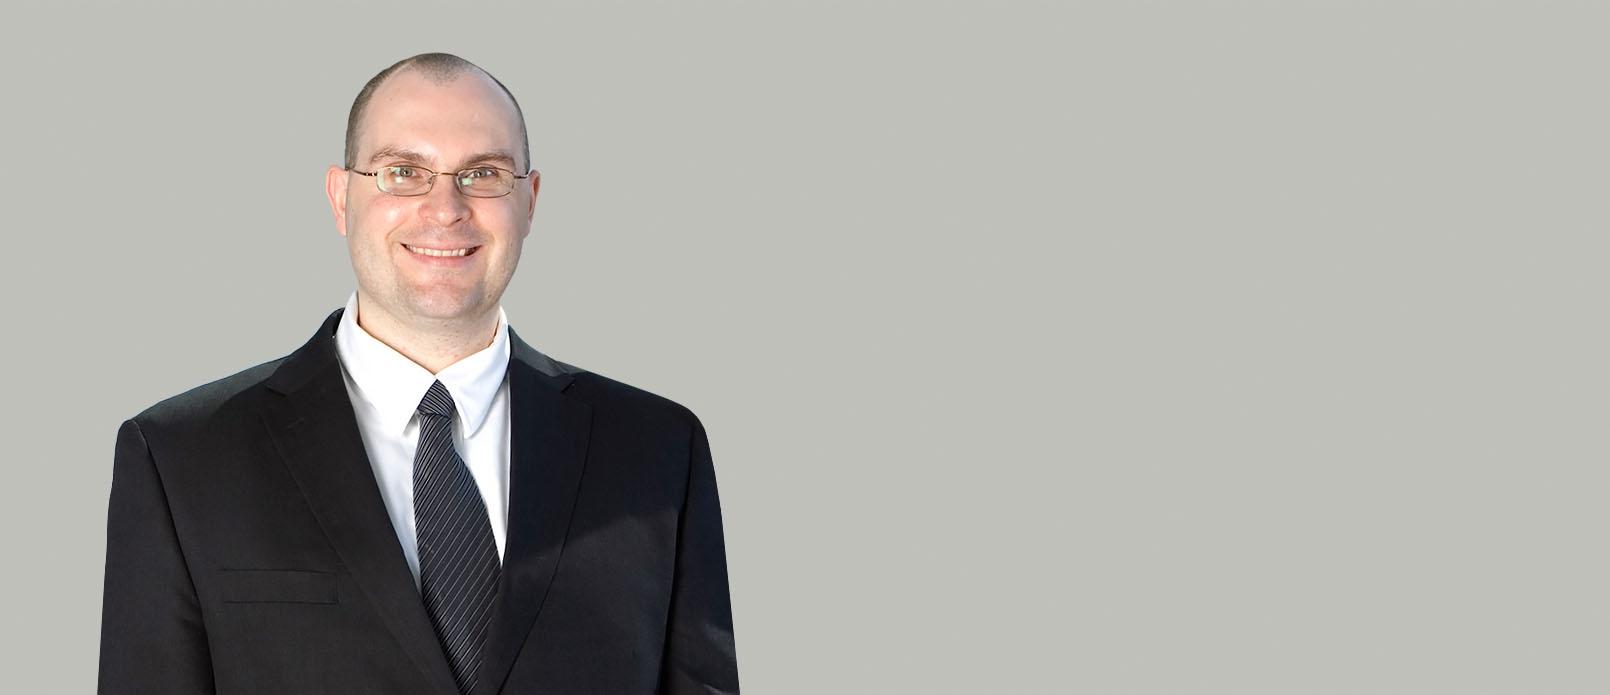 Nicholas A. Keppel